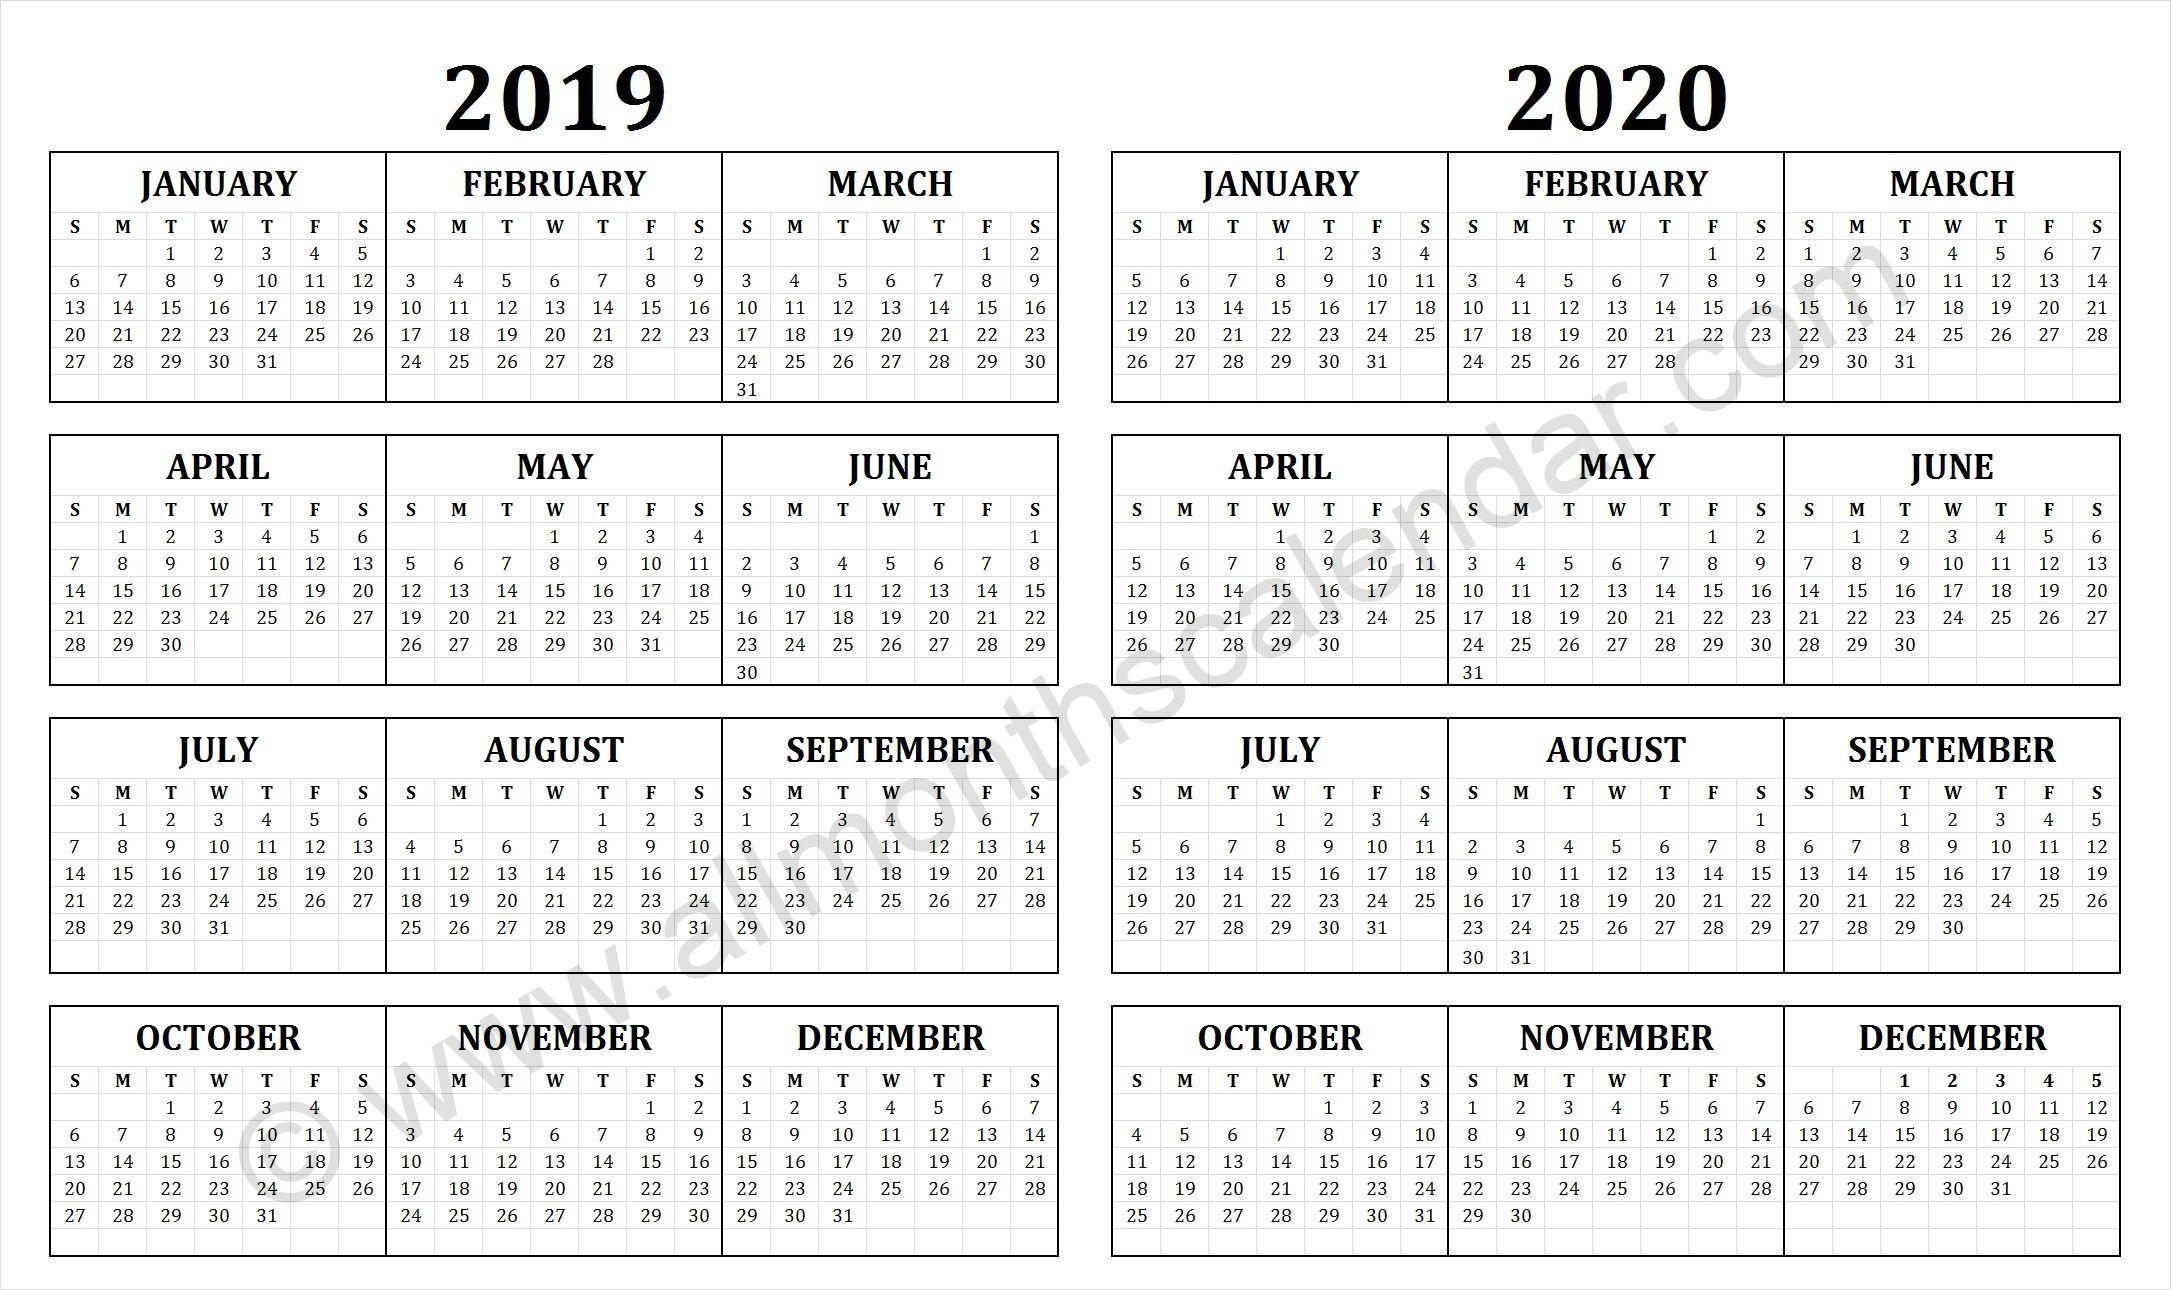 2019 And 2020 Calendar | Free Printable Calendar Templates intended for Quadax Julian Calendar 2020